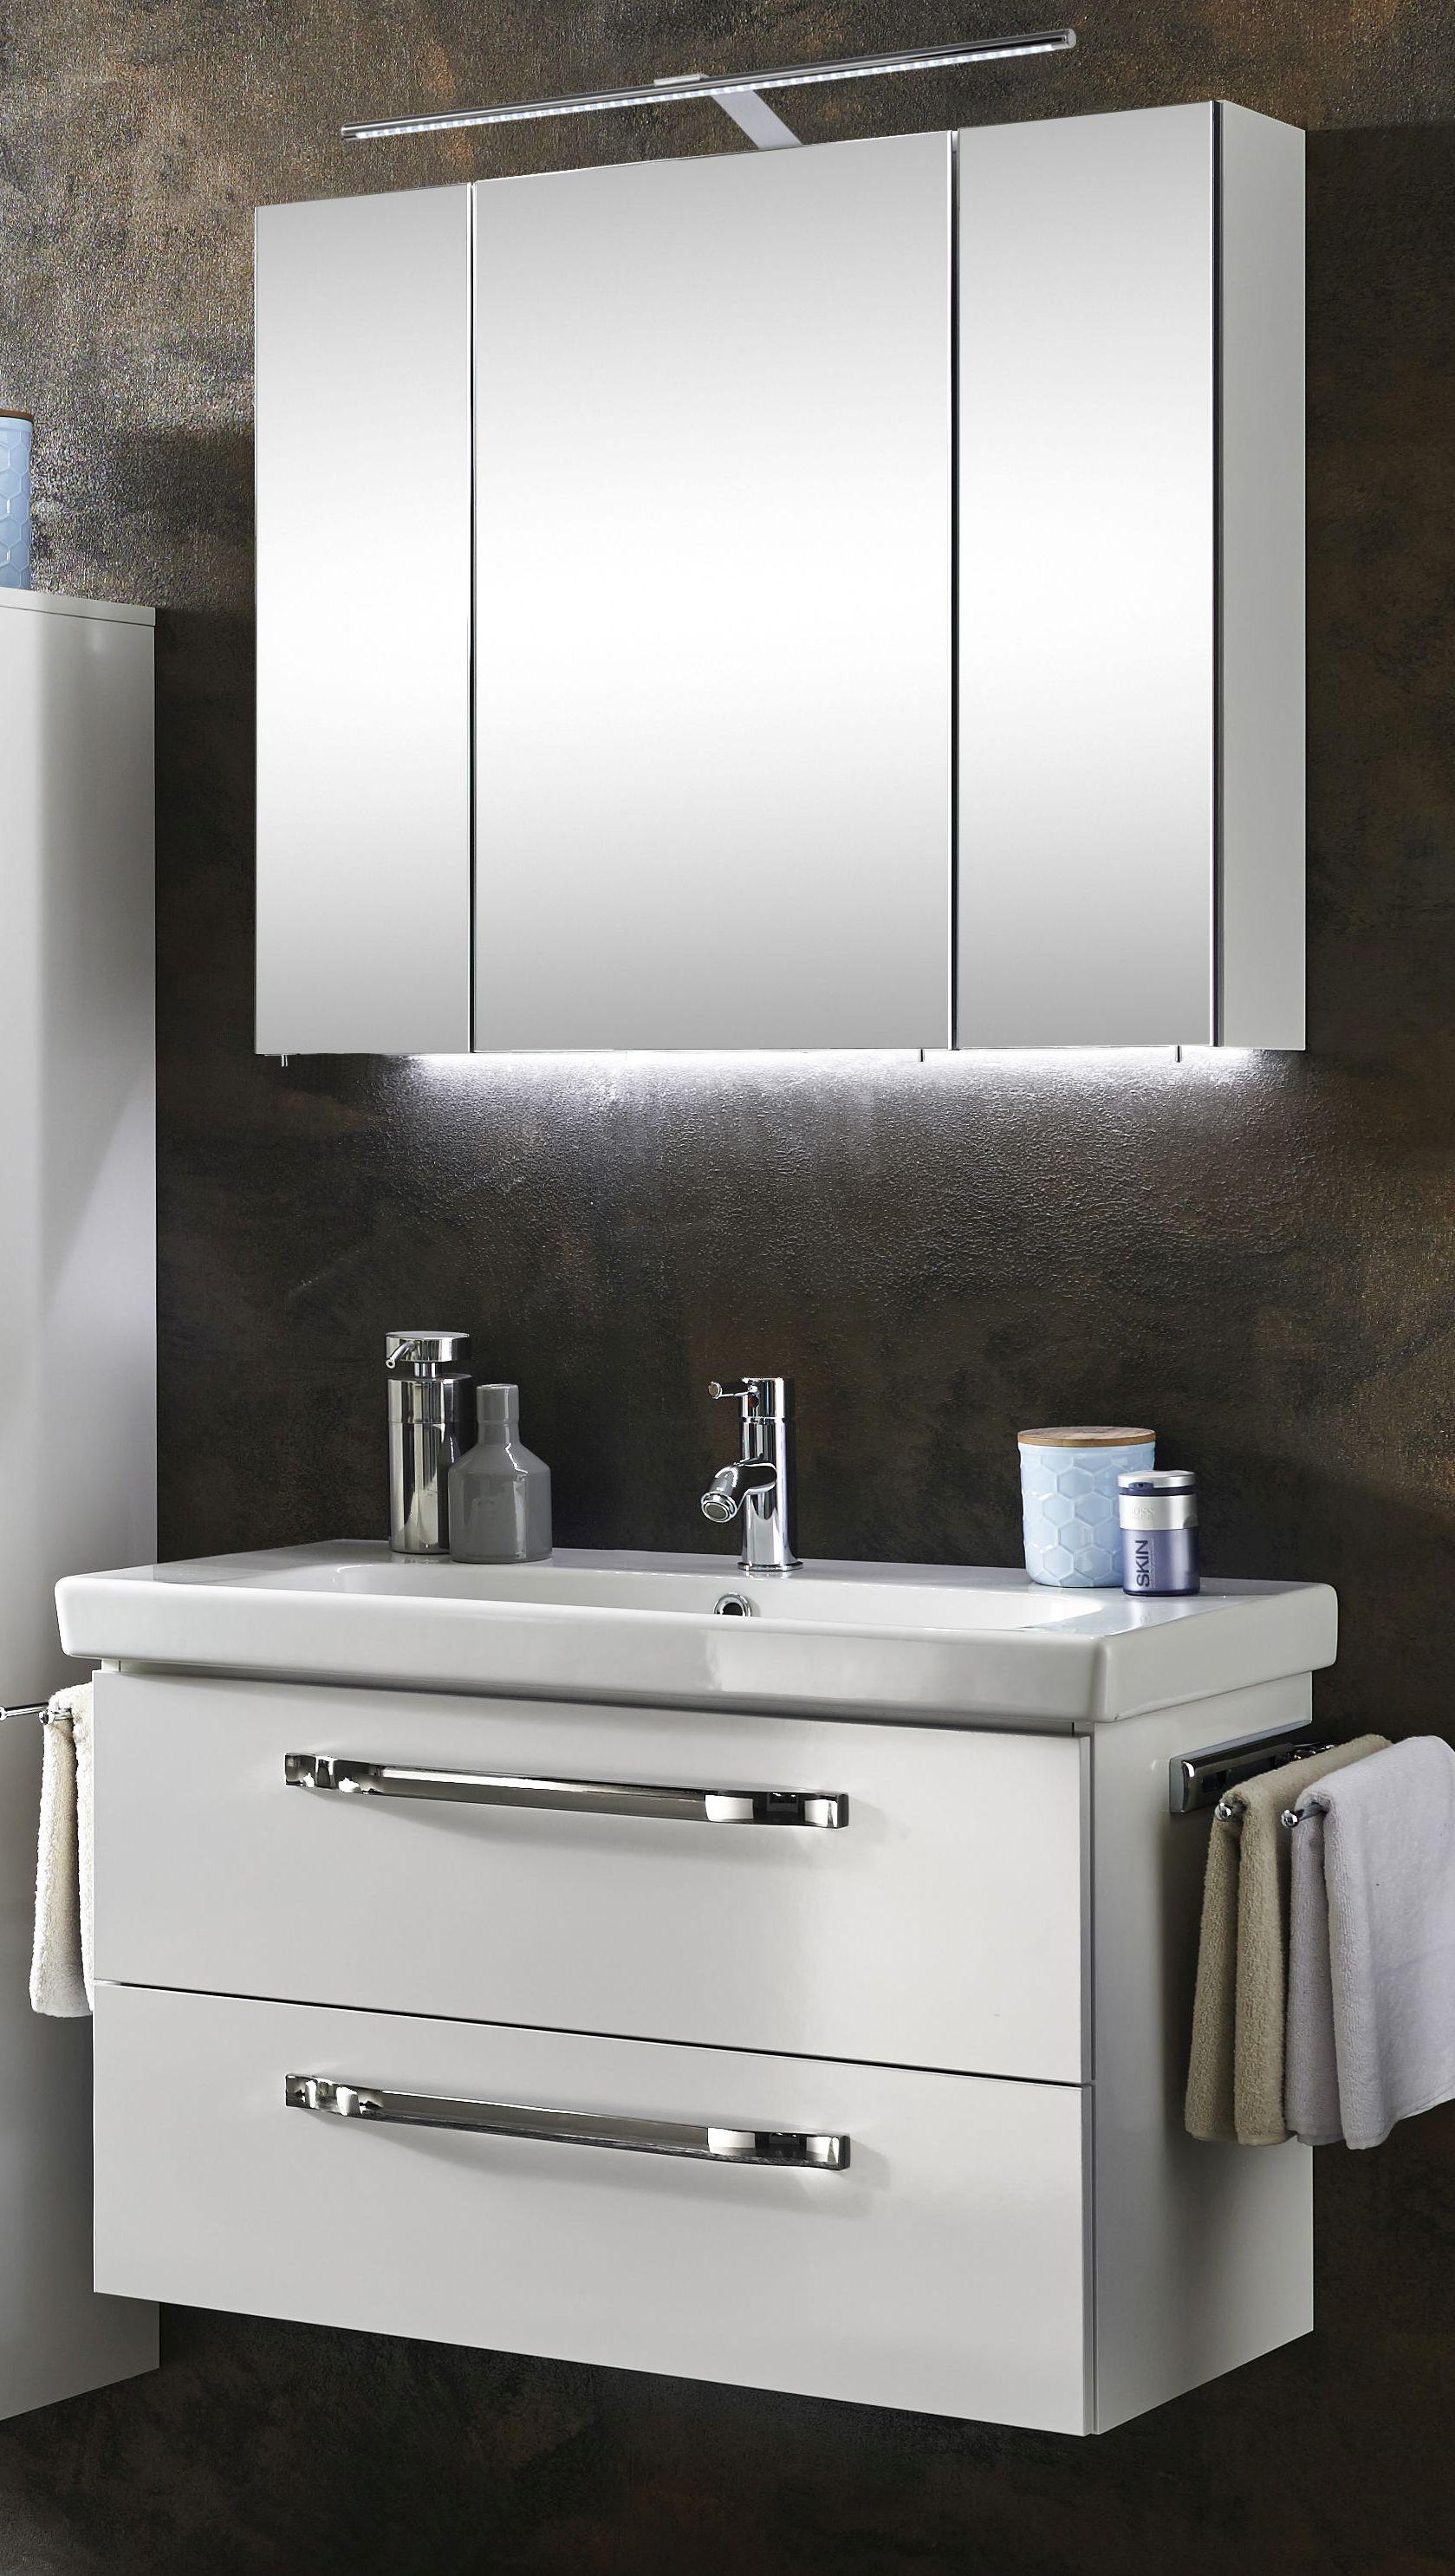 marlin bad 3060 badm bel set 85 cm breit spiegelschrank. Black Bedroom Furniture Sets. Home Design Ideas